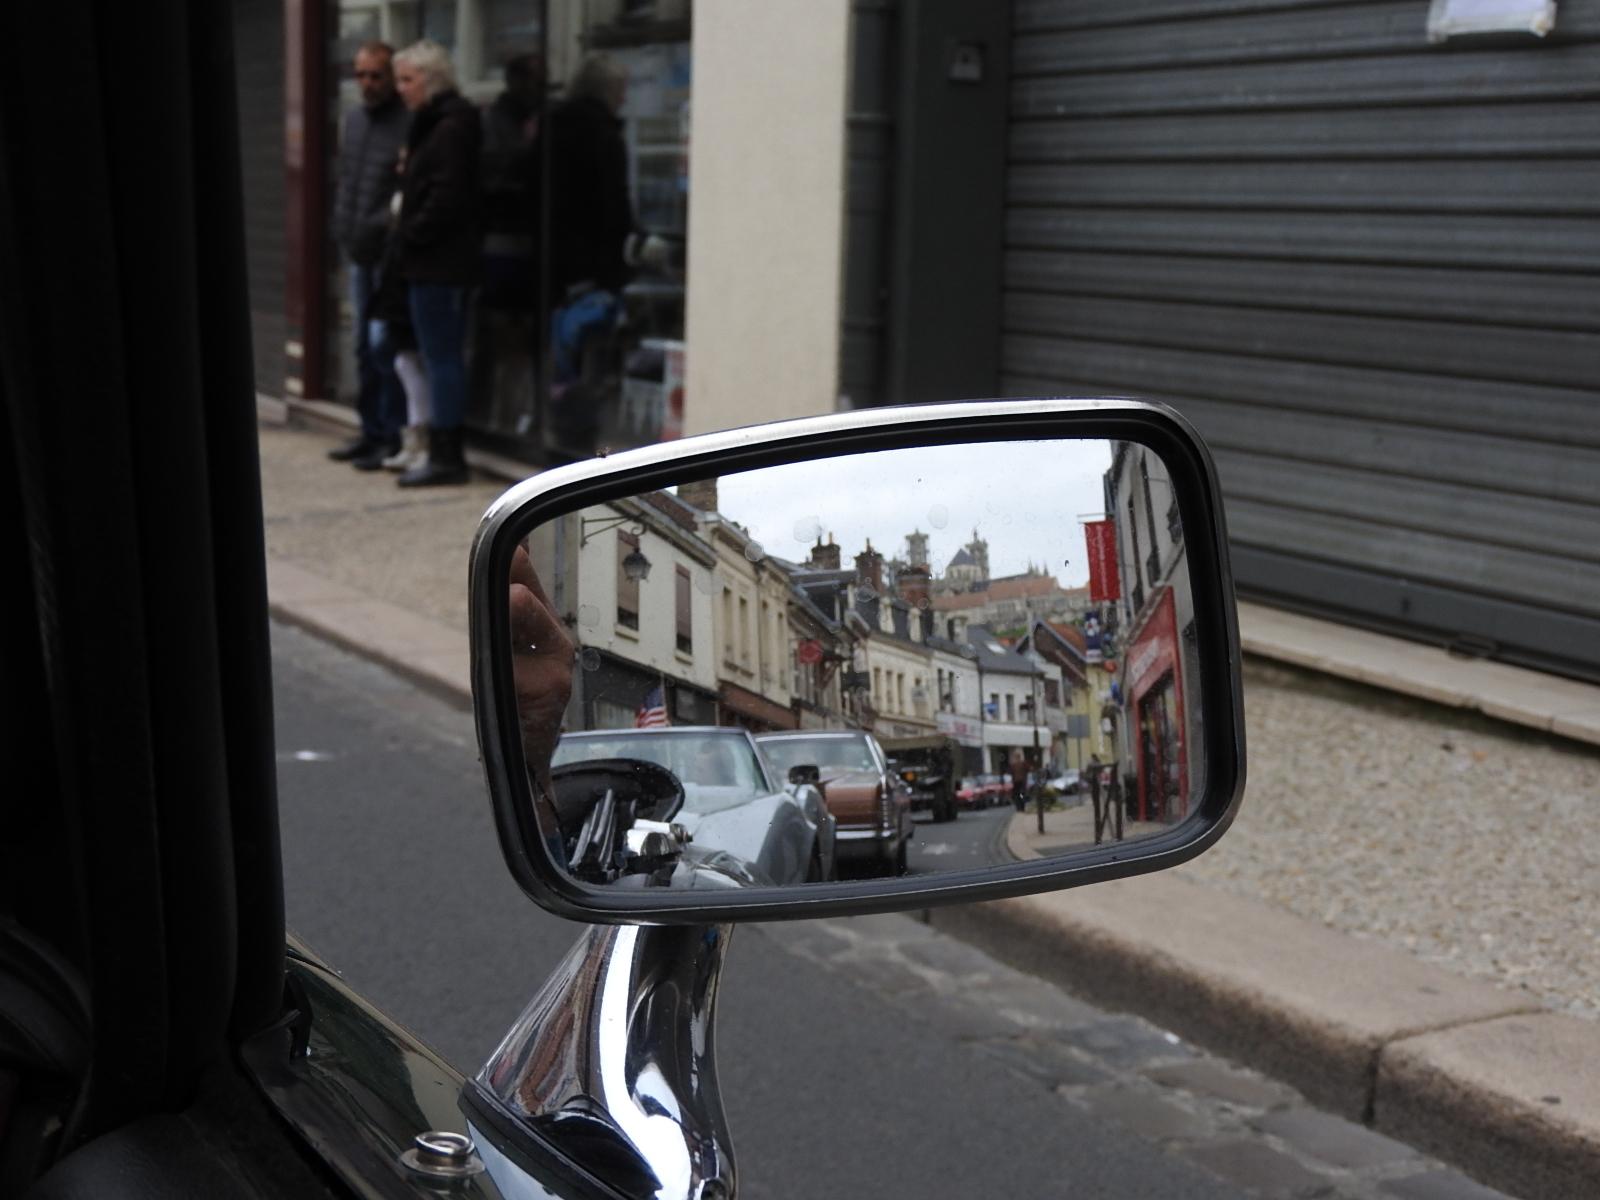 Arty mirror shot